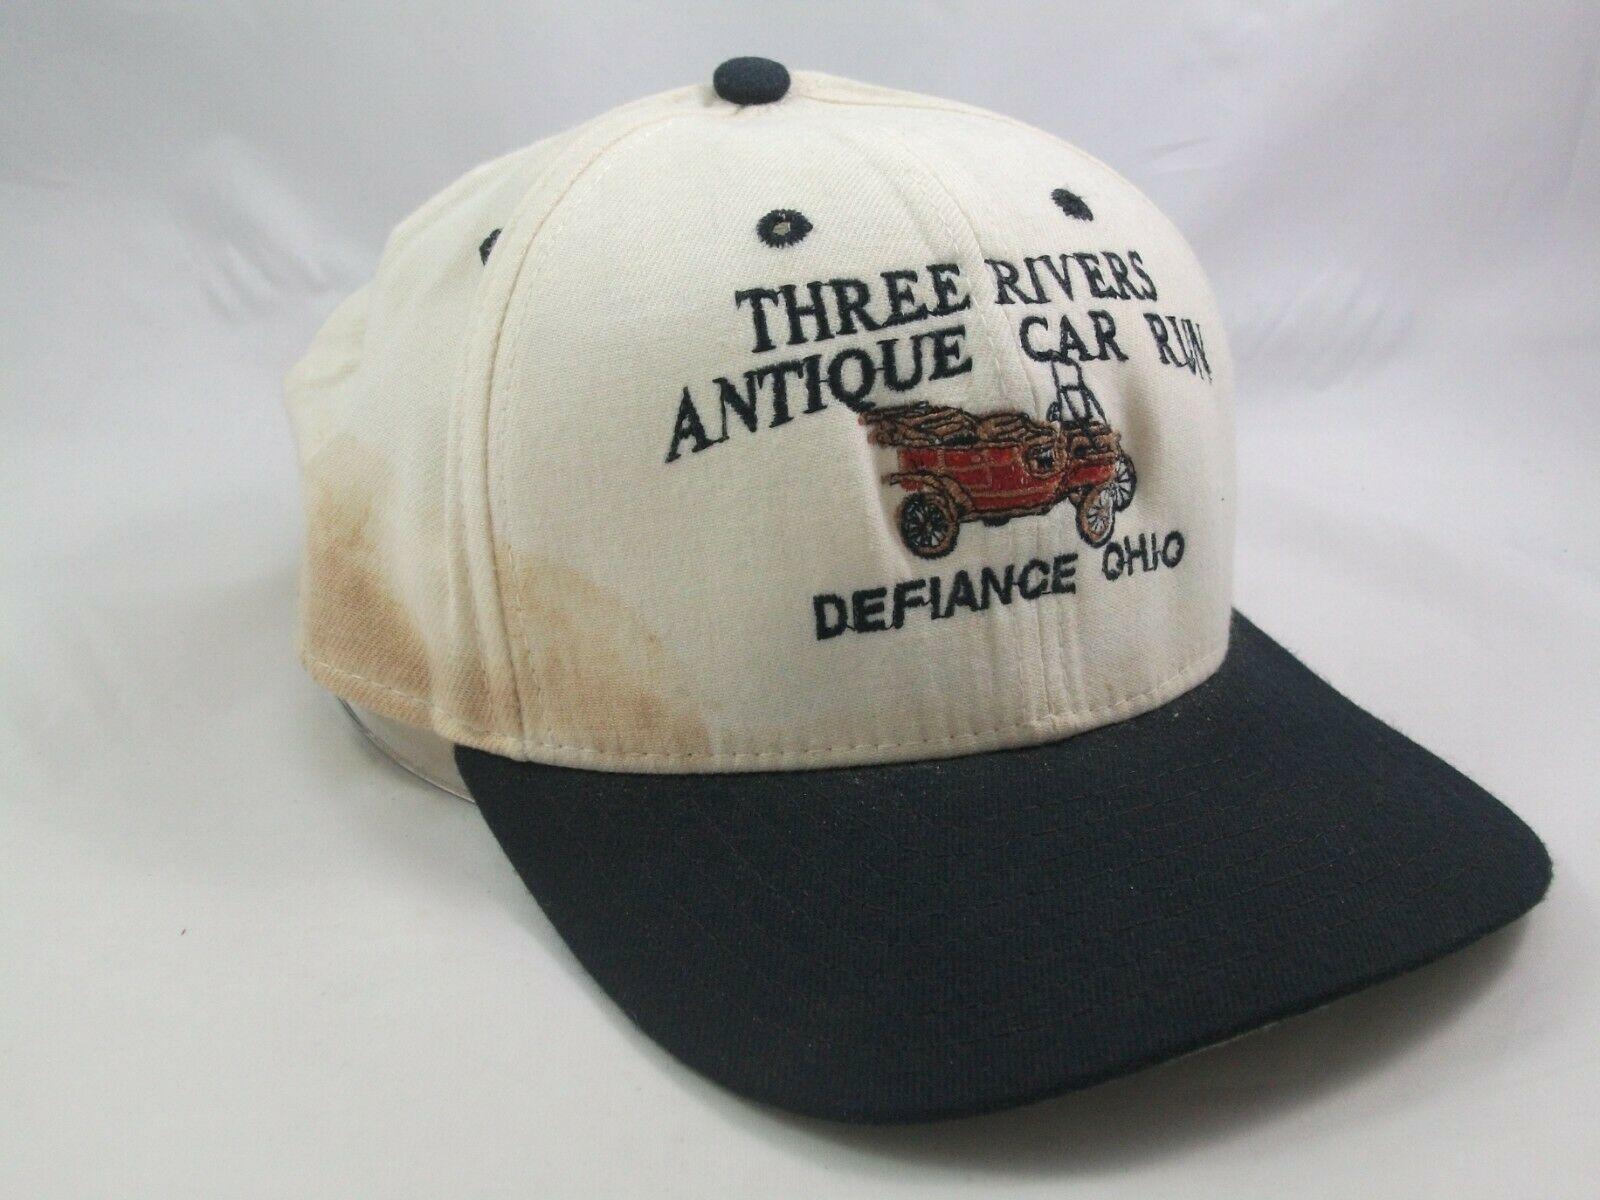 Three Rivers Antique Car Run Defiance Ohio Hat Beige Black Snapback Baseball Cap